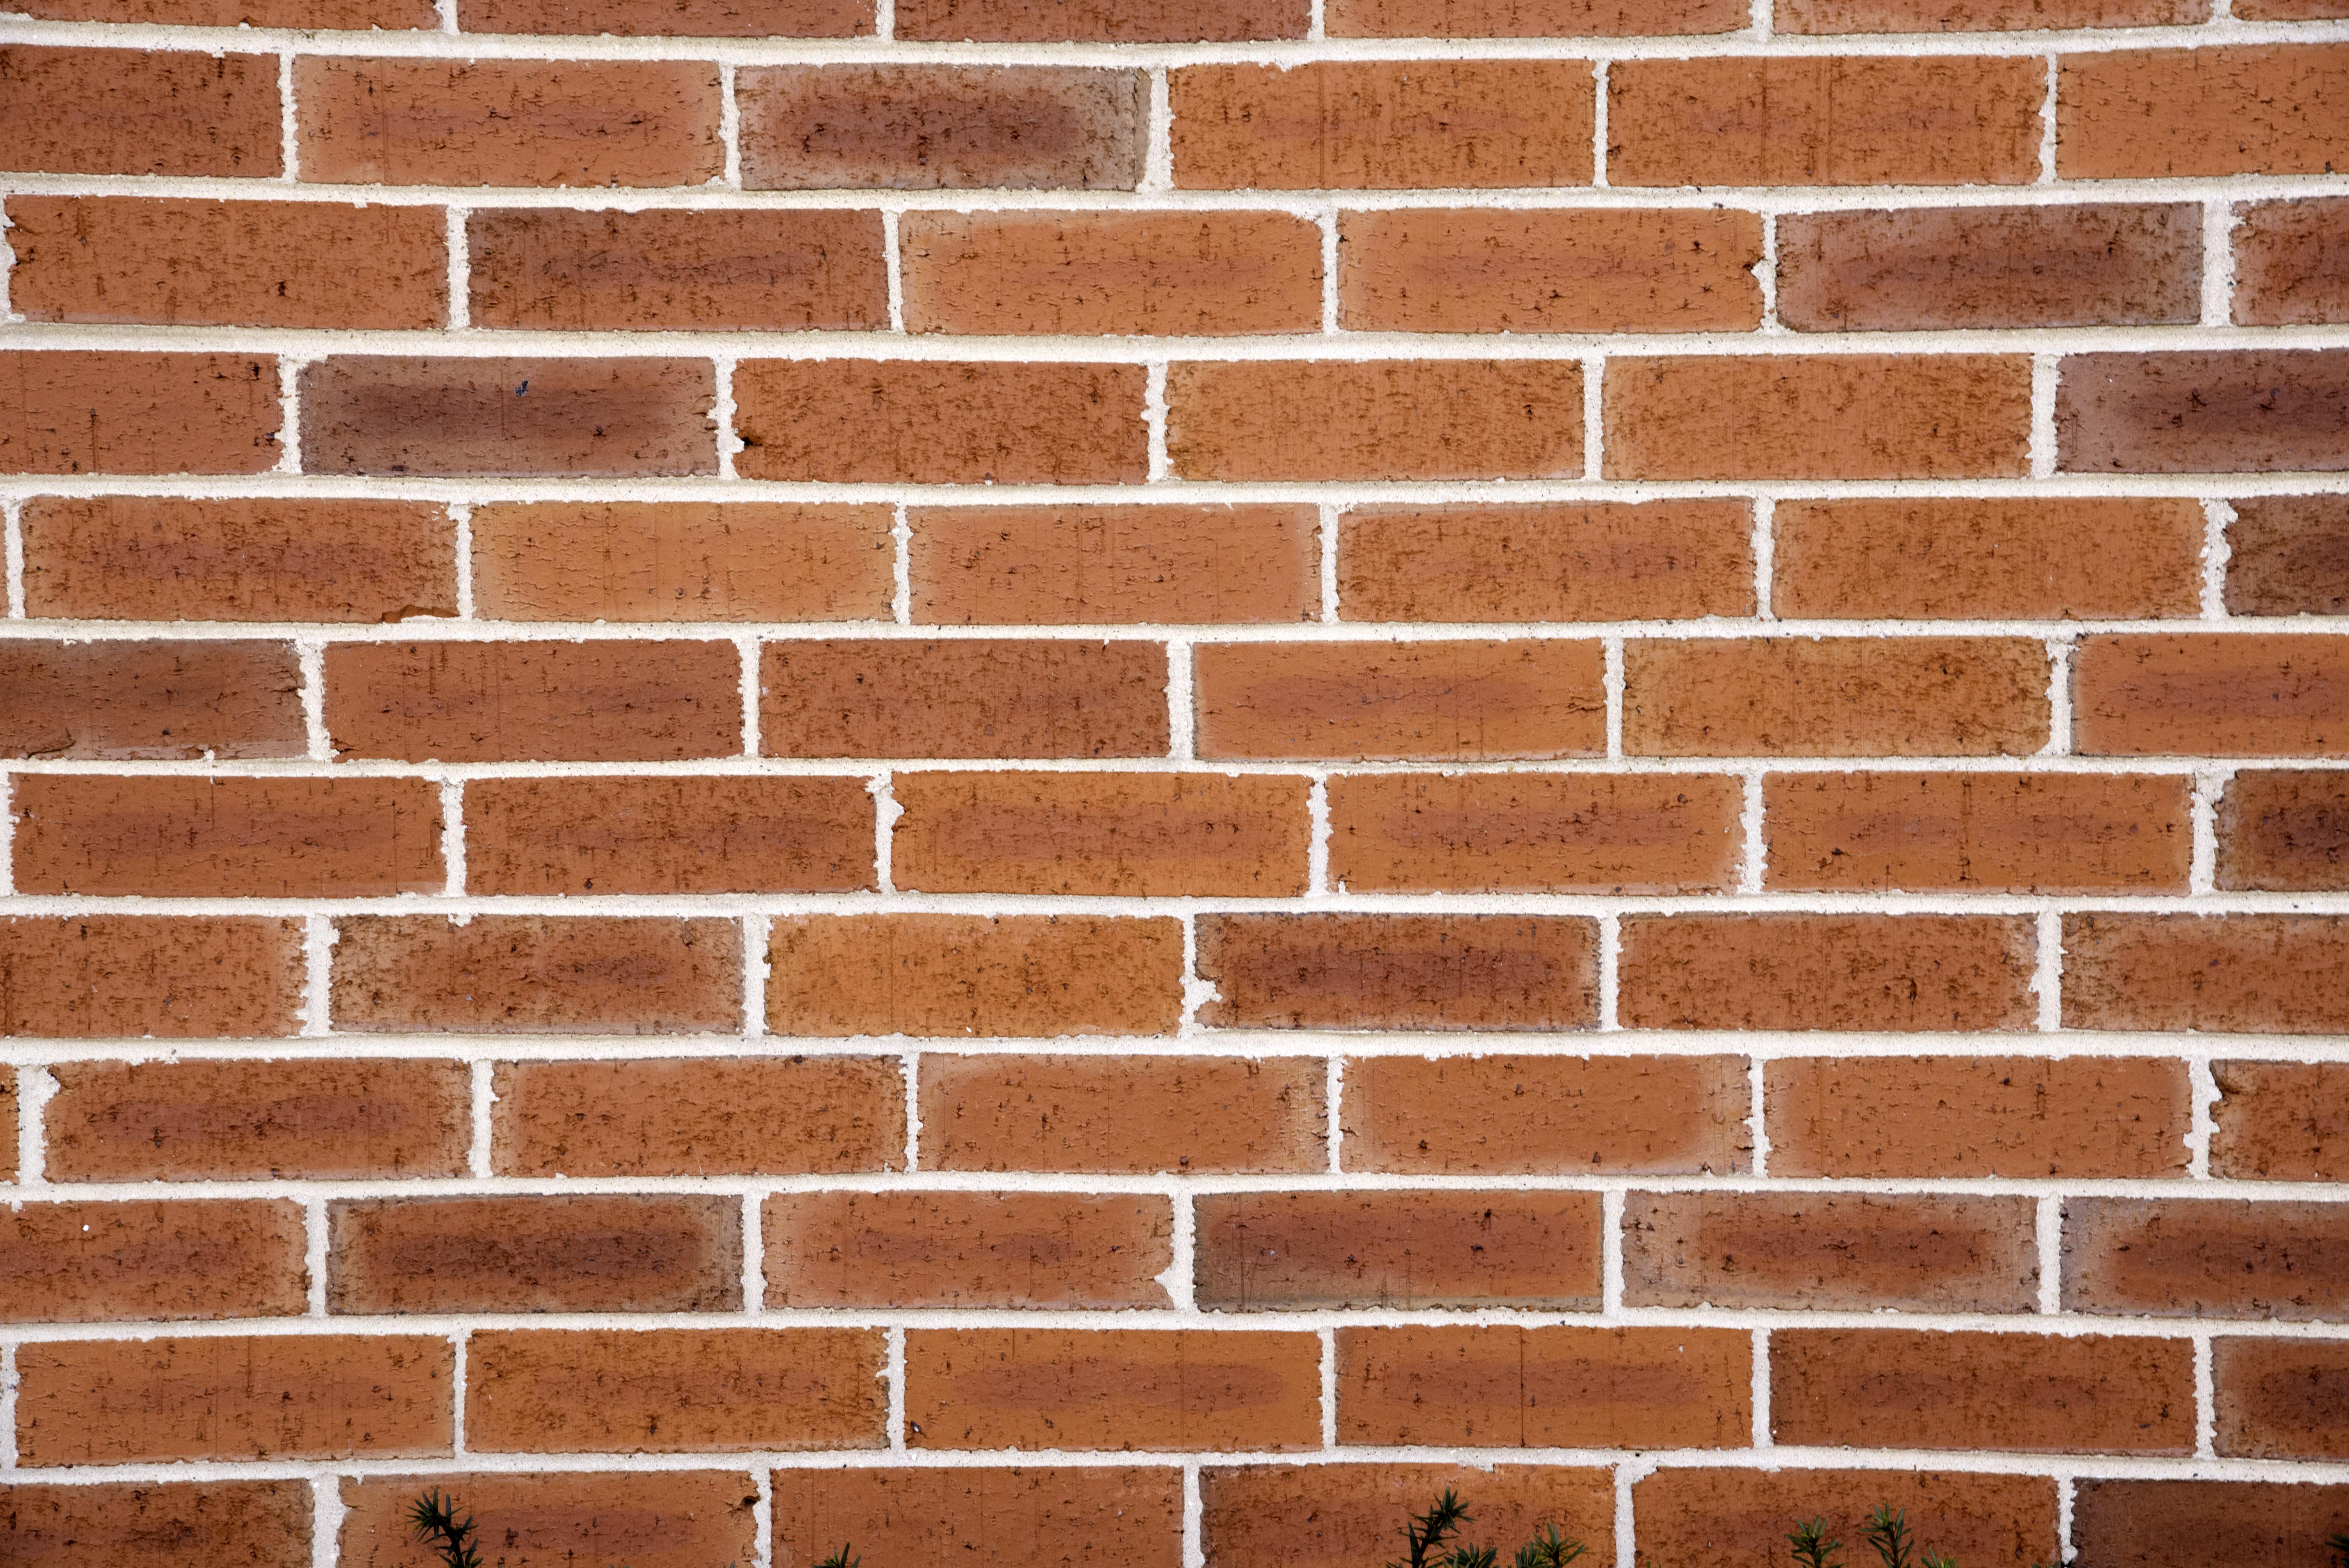 Brick Wall Patterns With Many Bricks Image Free Stock Photo